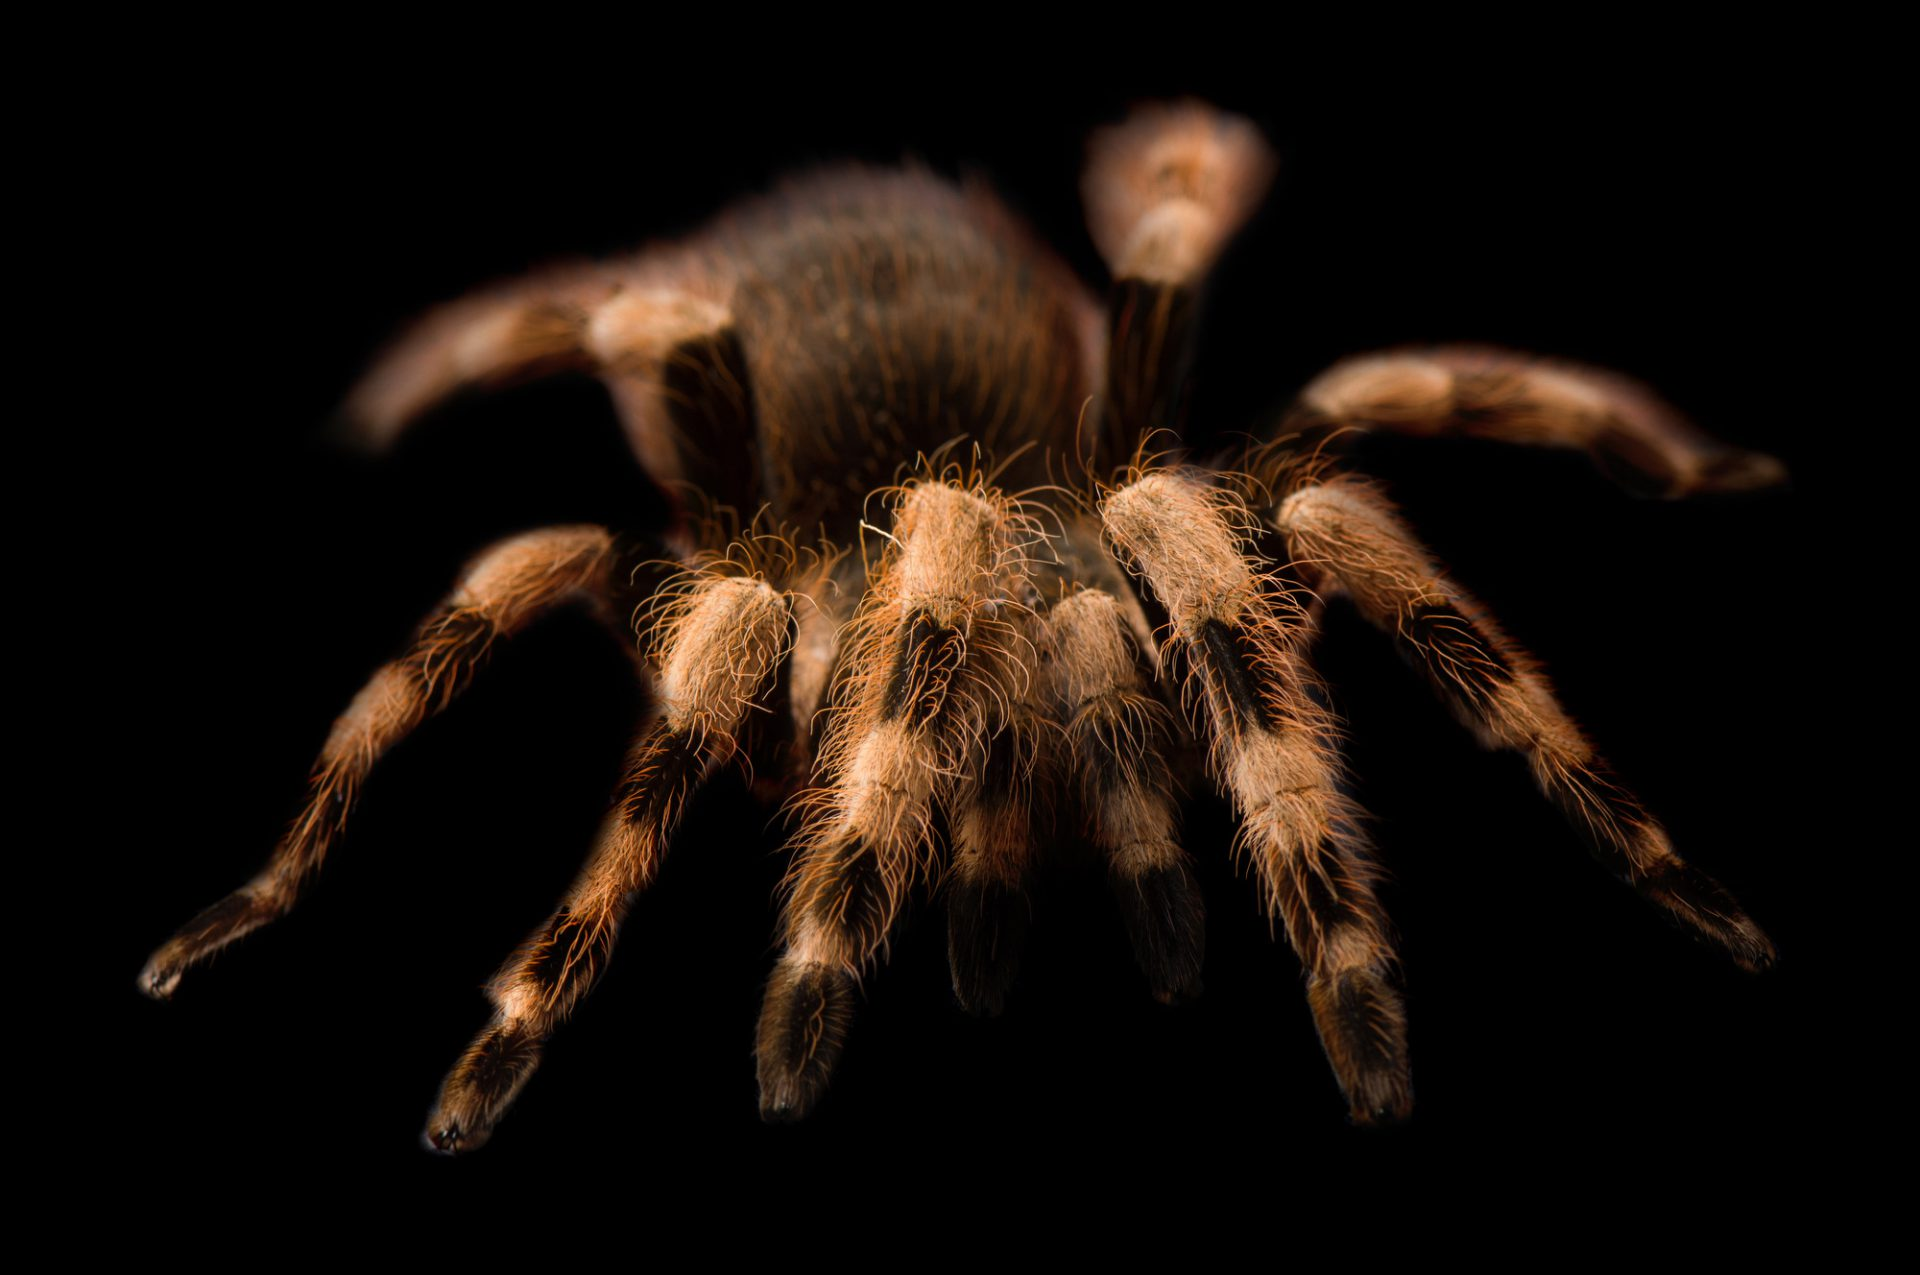 Photo: A Brazilian white-banded tarantula (Nhandu colloratovillosus) at the Safari Land Pet Store.